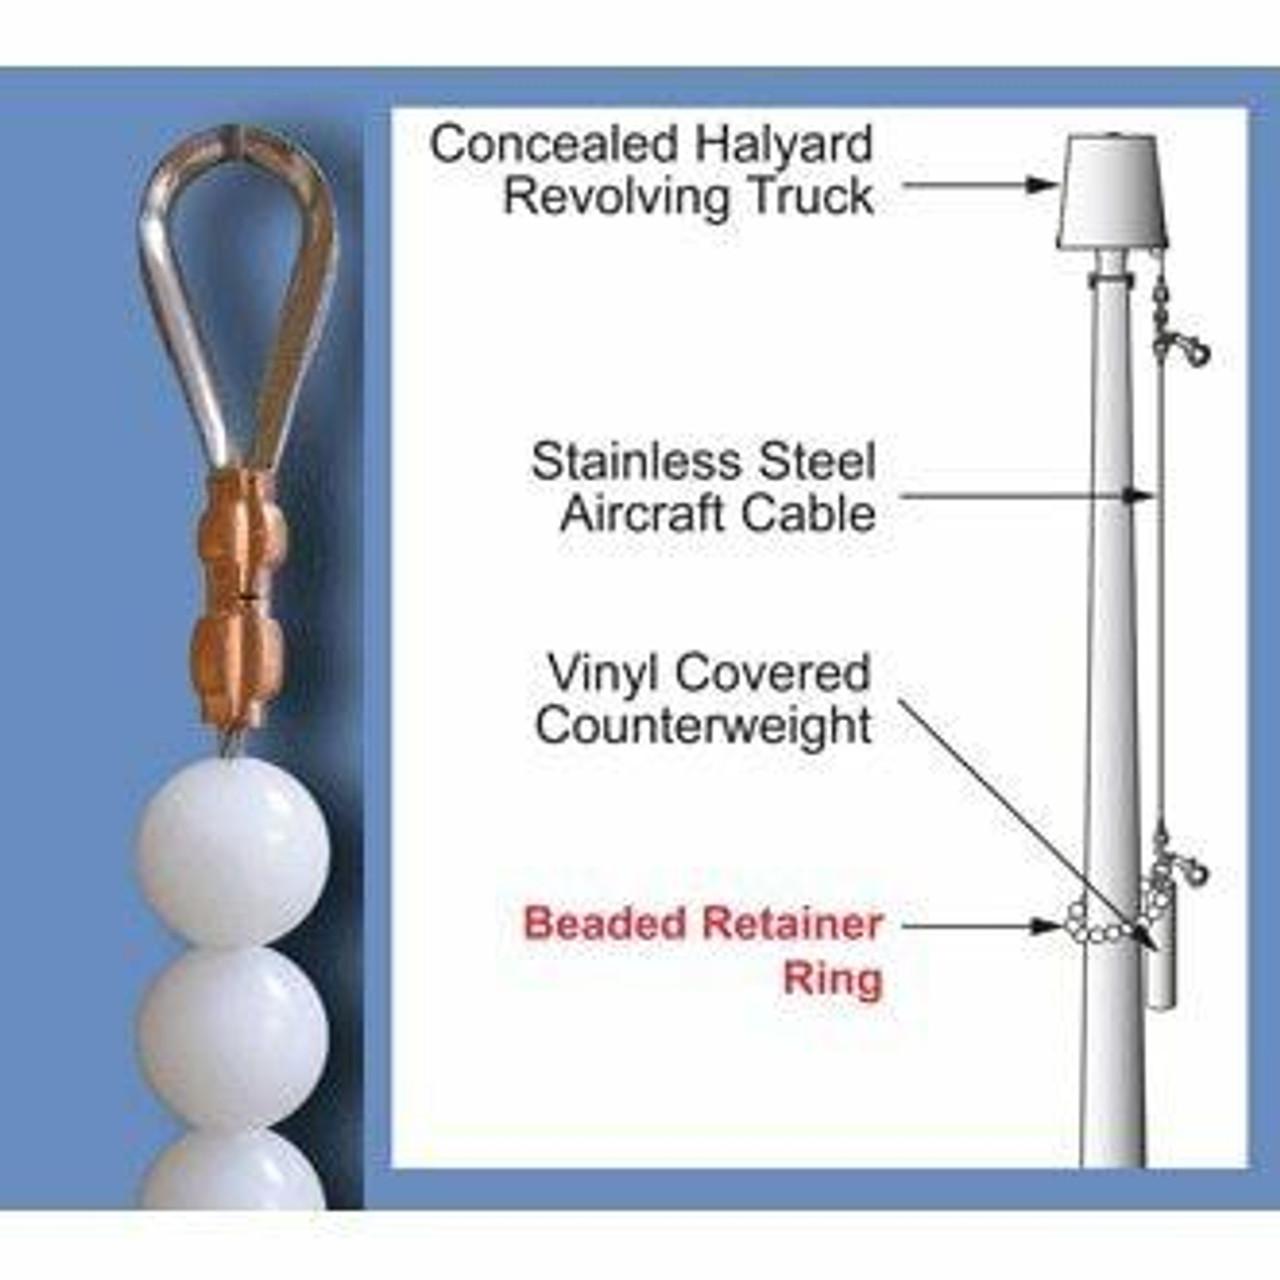 Beaded Retainer Ring